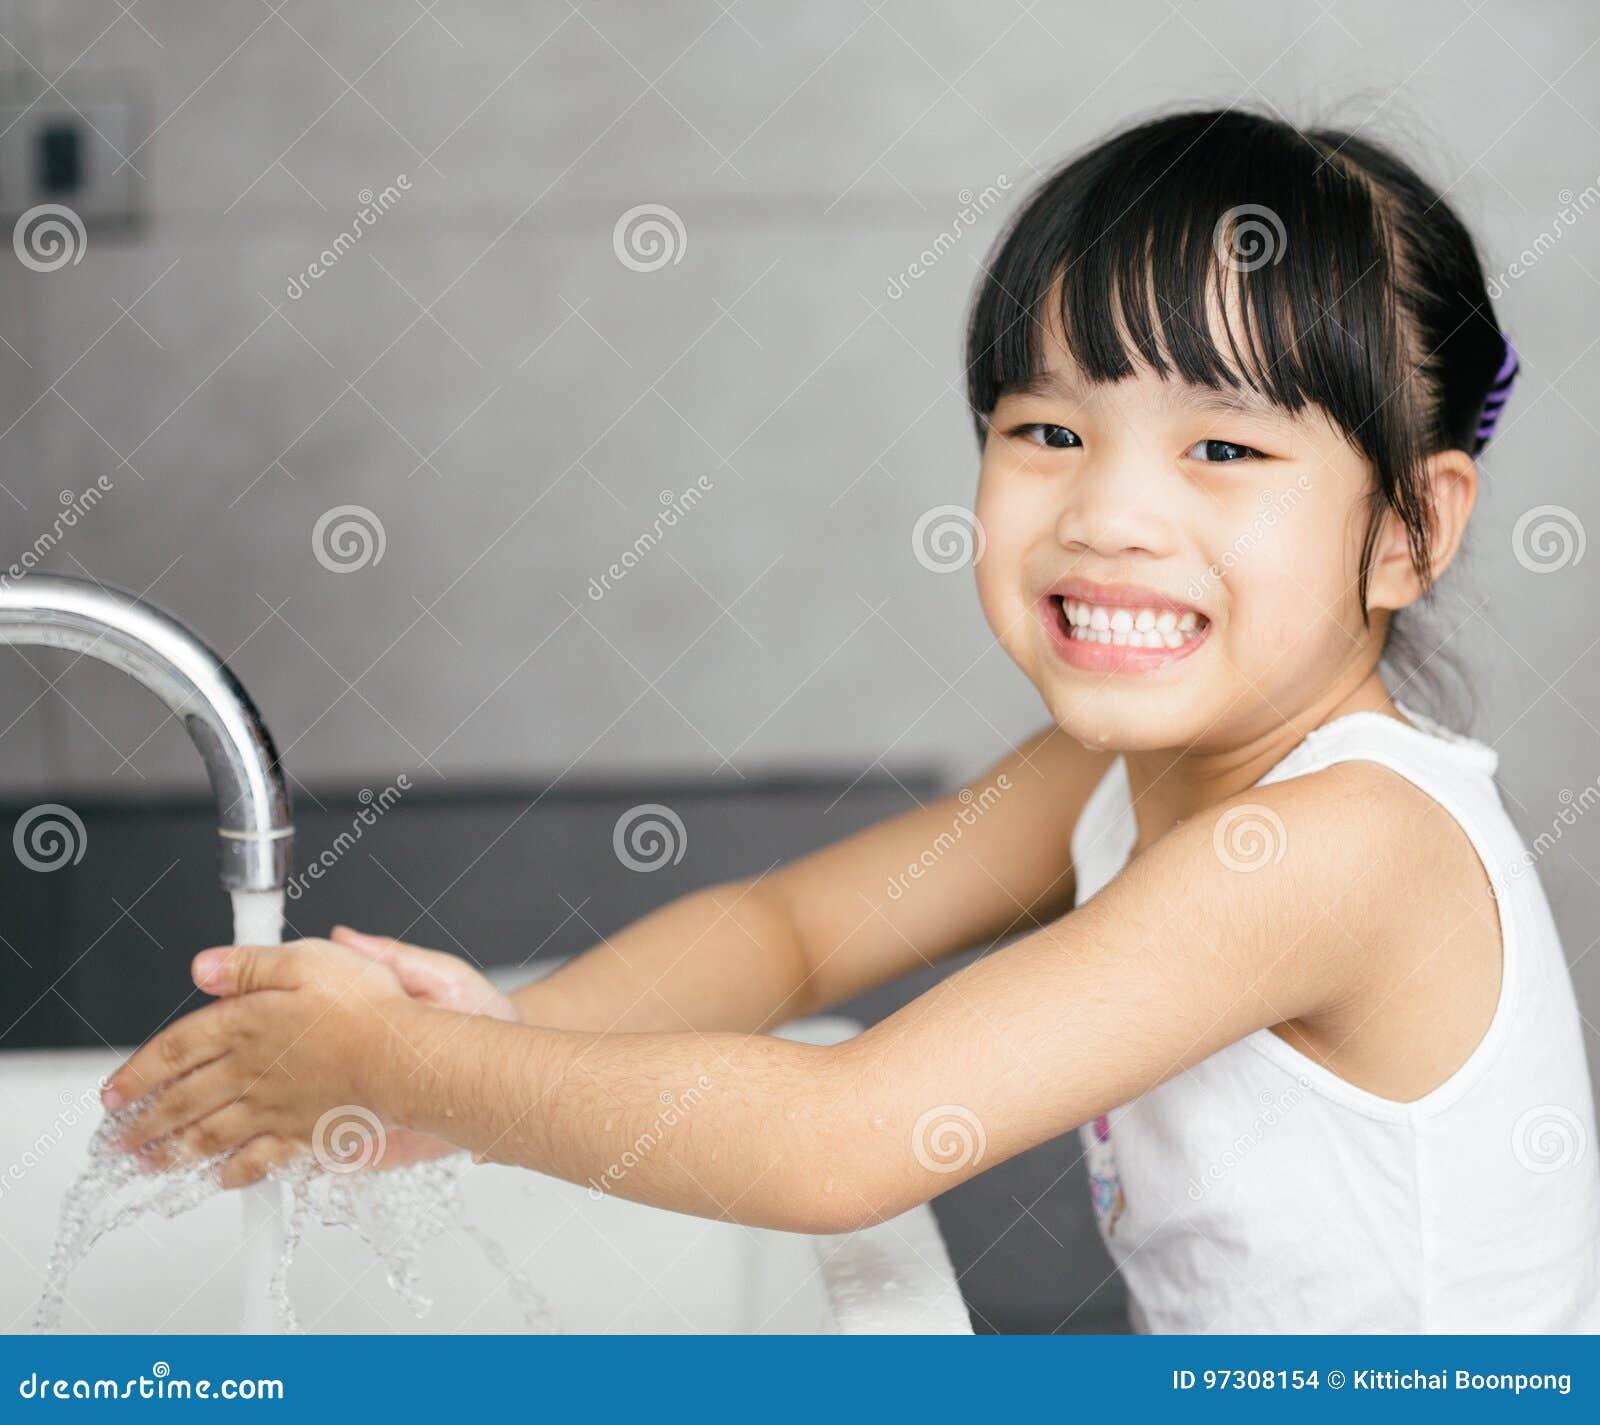 Asian Child Washing Hands